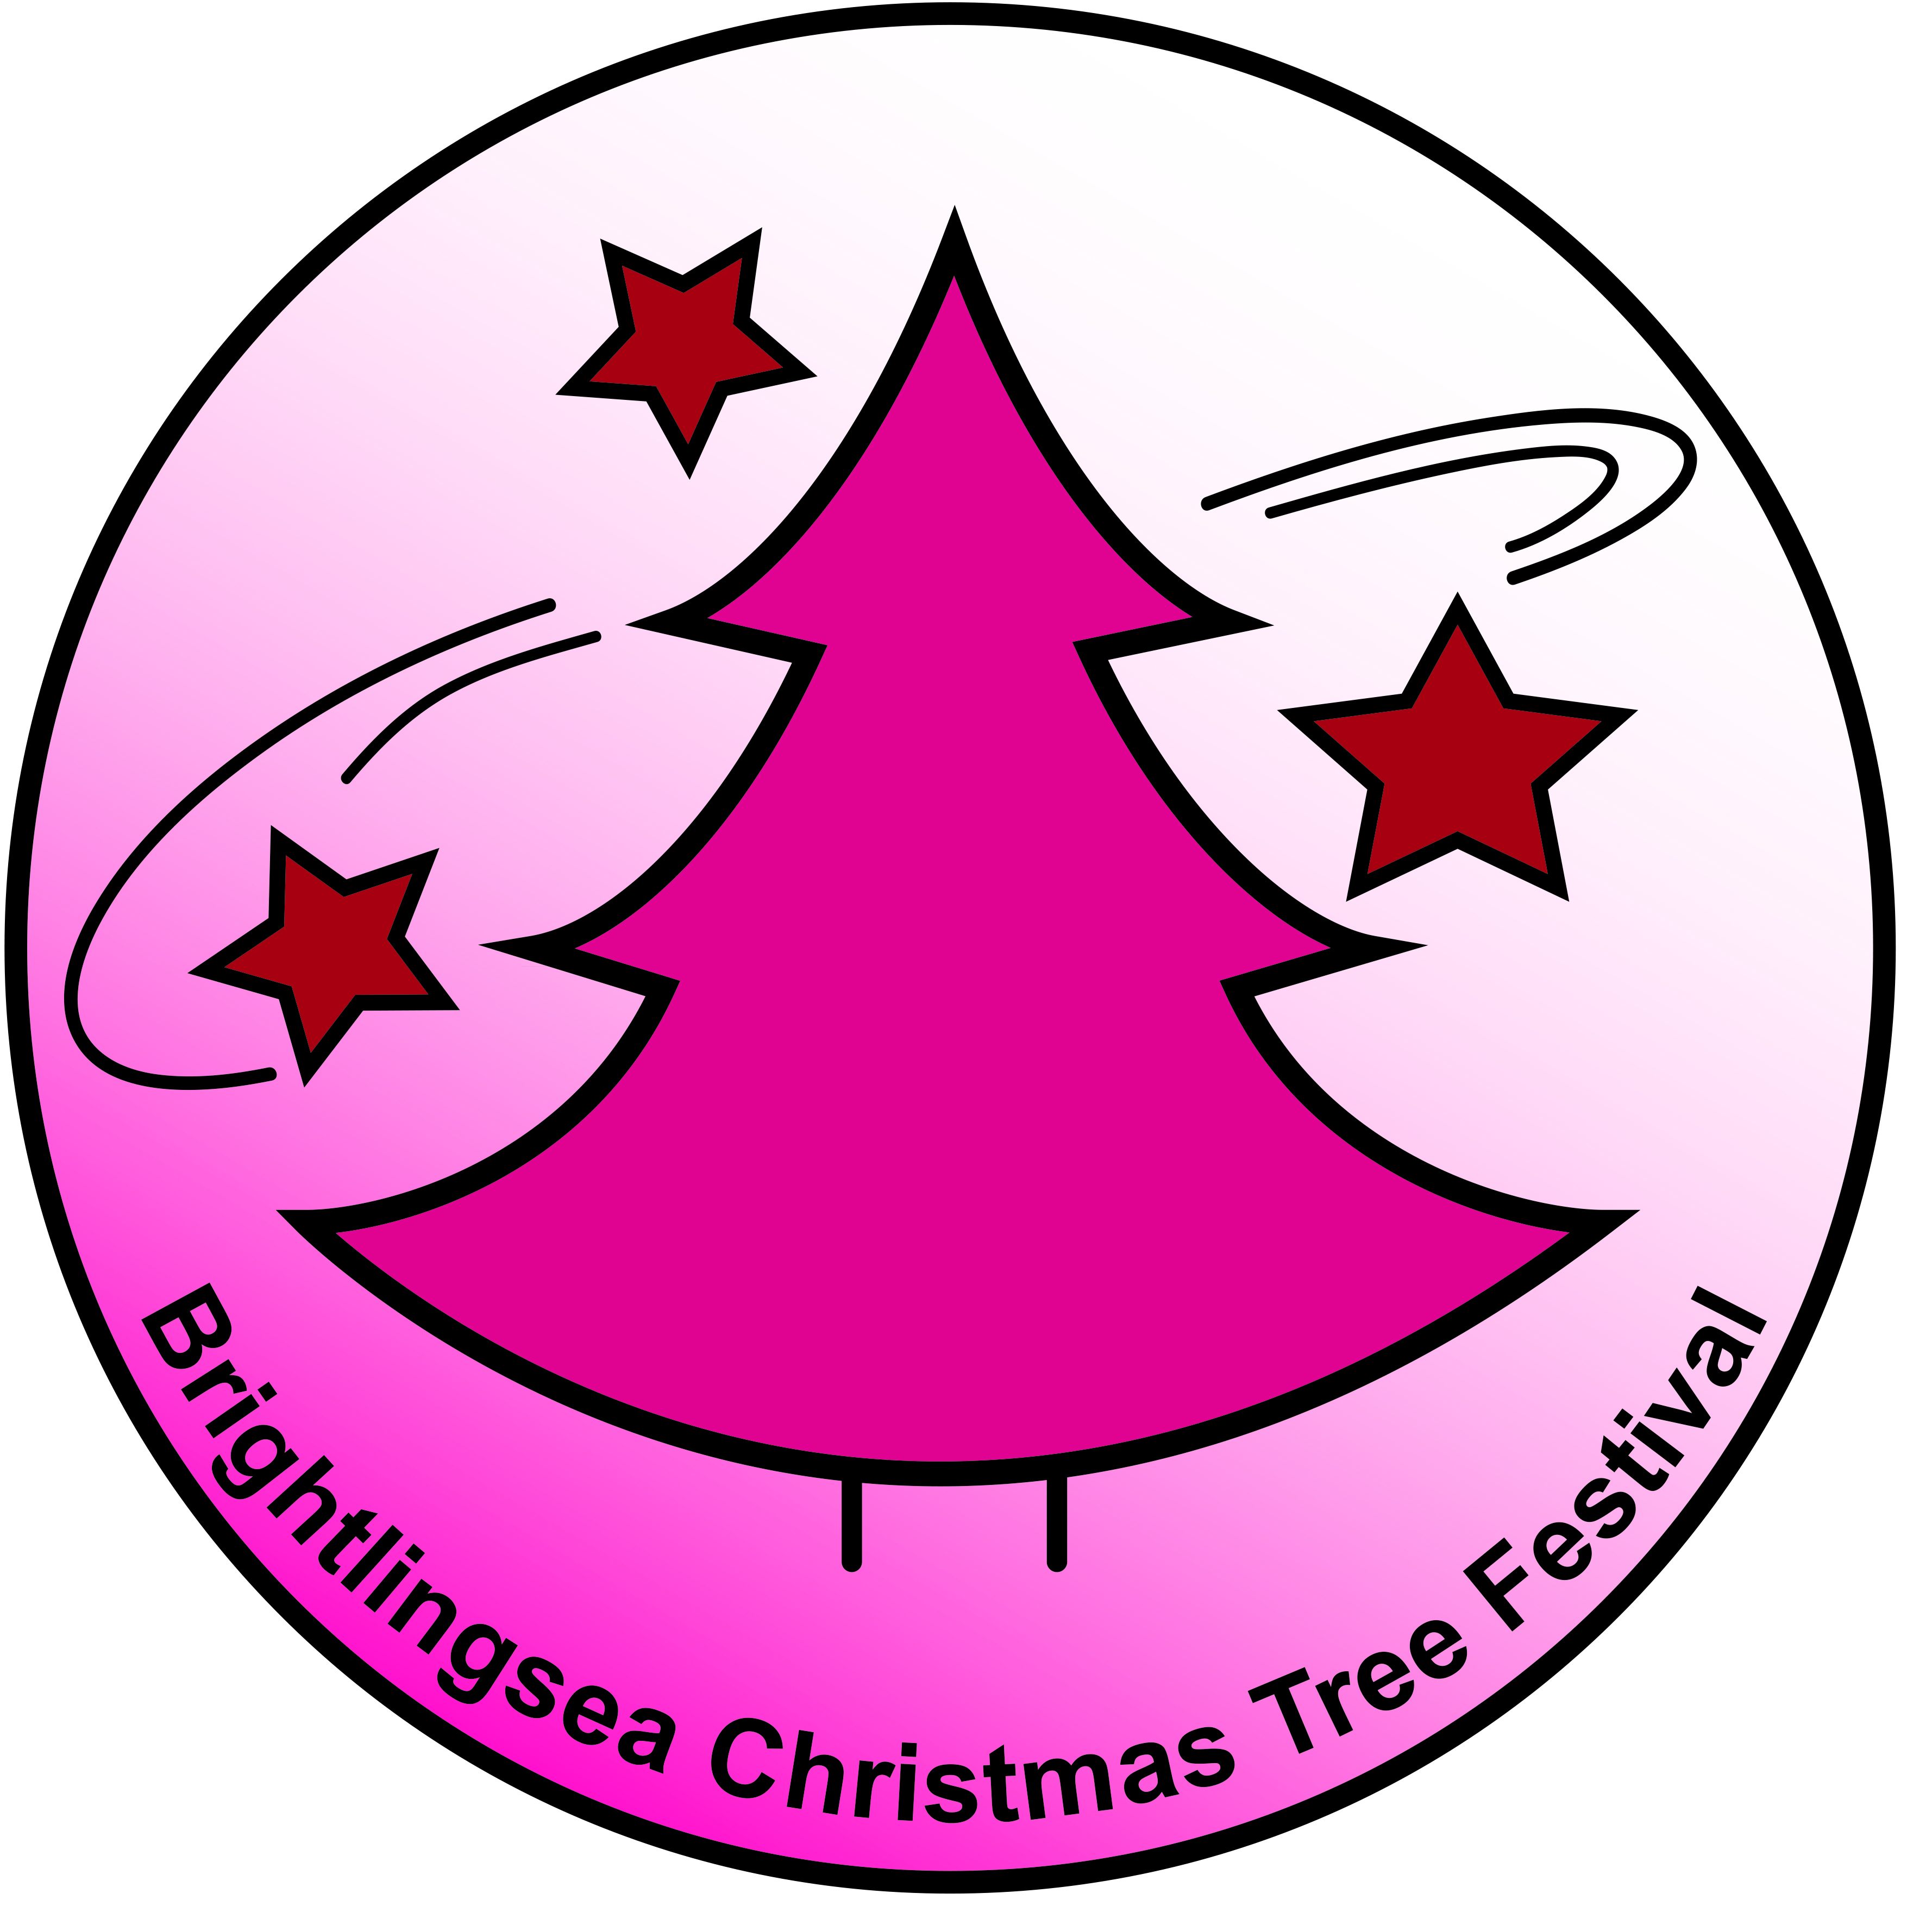 Brightlingsea Christmas Tree Festival